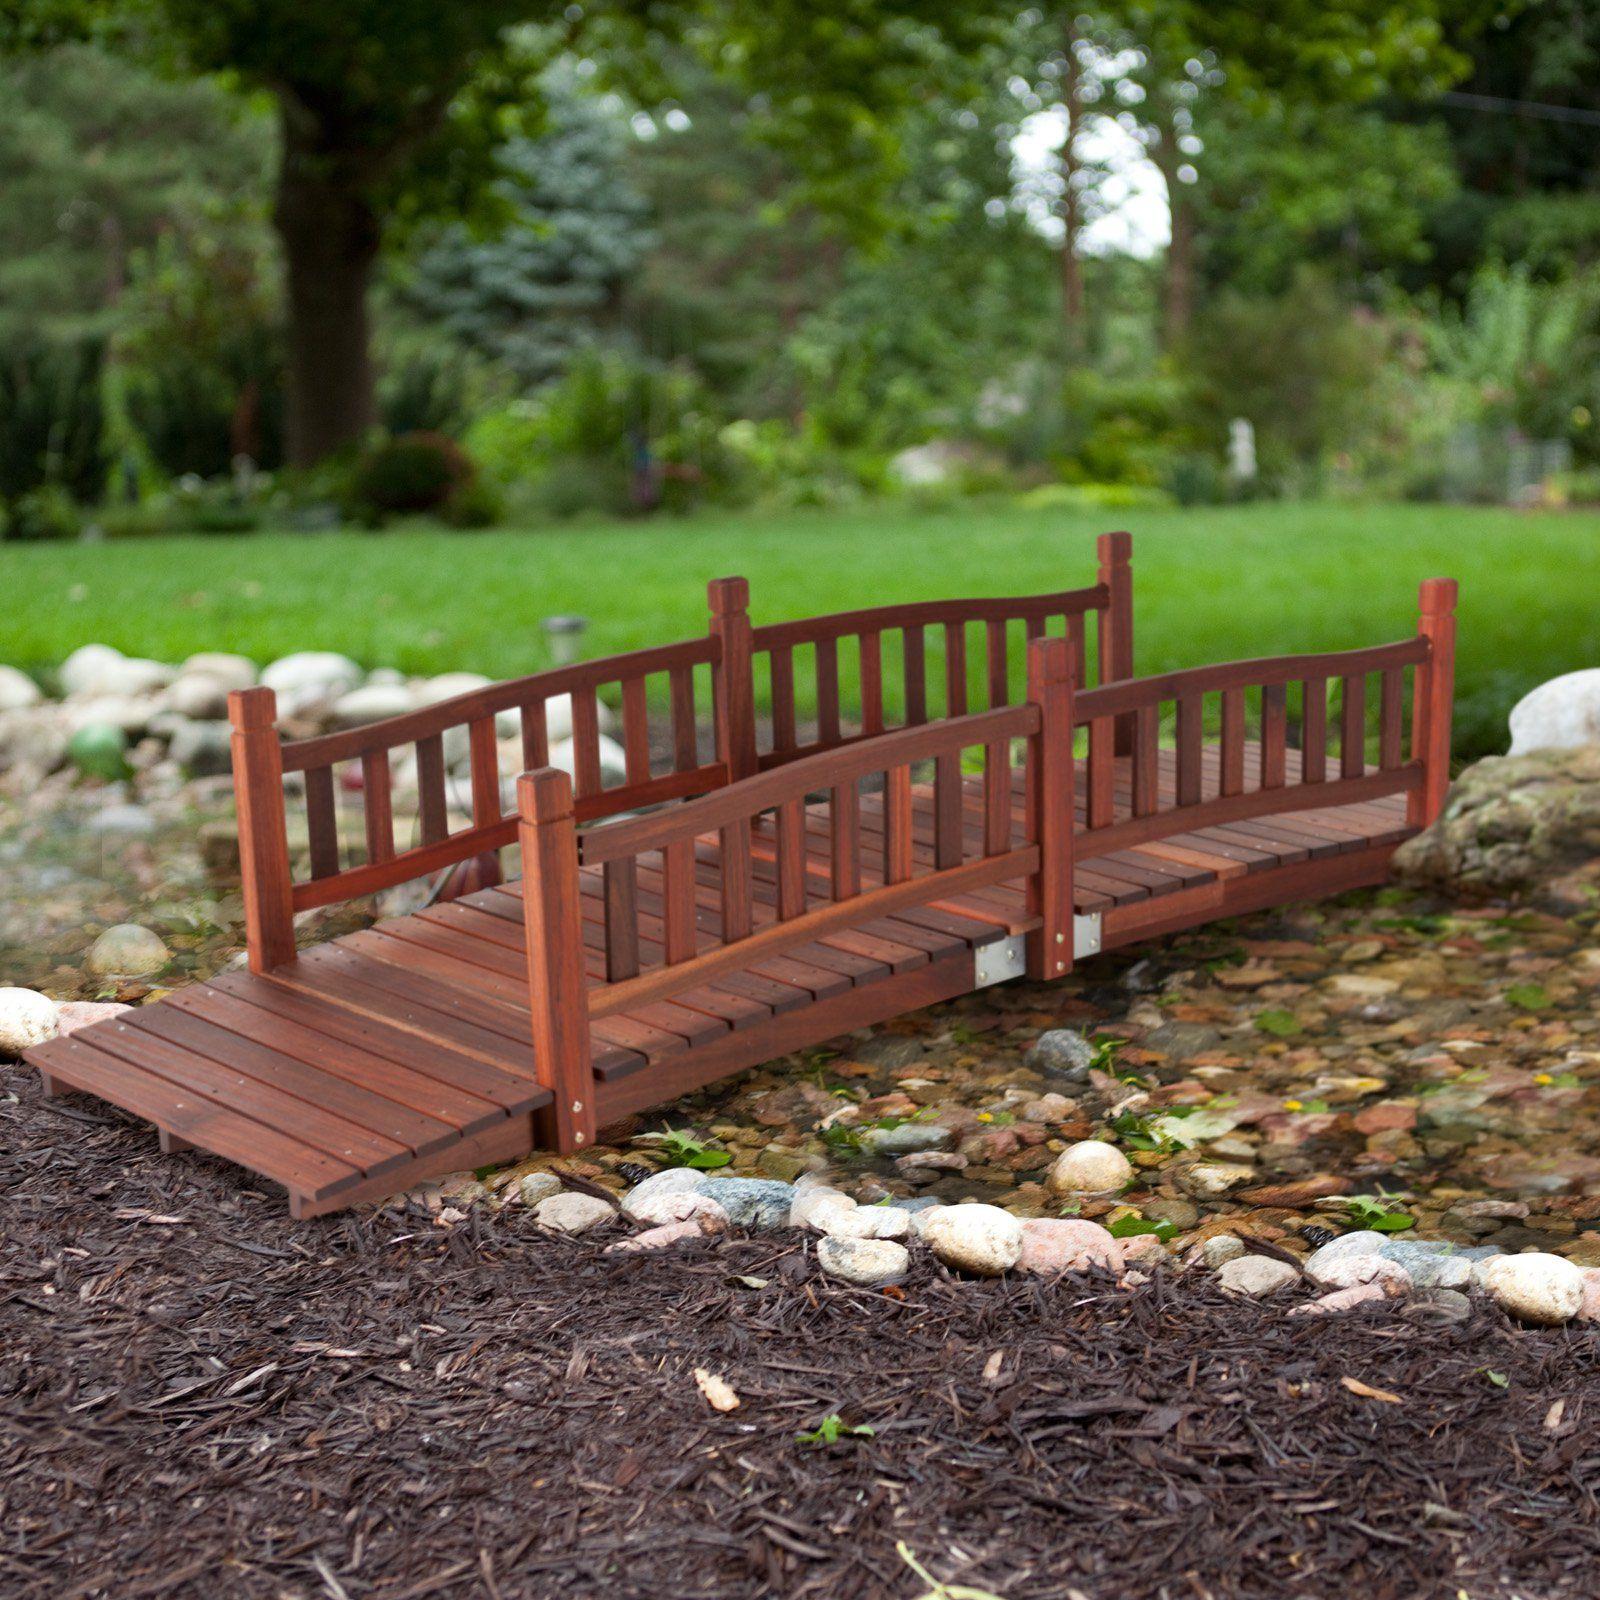 How To Build Wooden Bridge | Cedar Bridge Shop. Com Garden Bridges 4 52ft.  Long | Wedding | Pinterest | Bridges, Bridge And Gardens